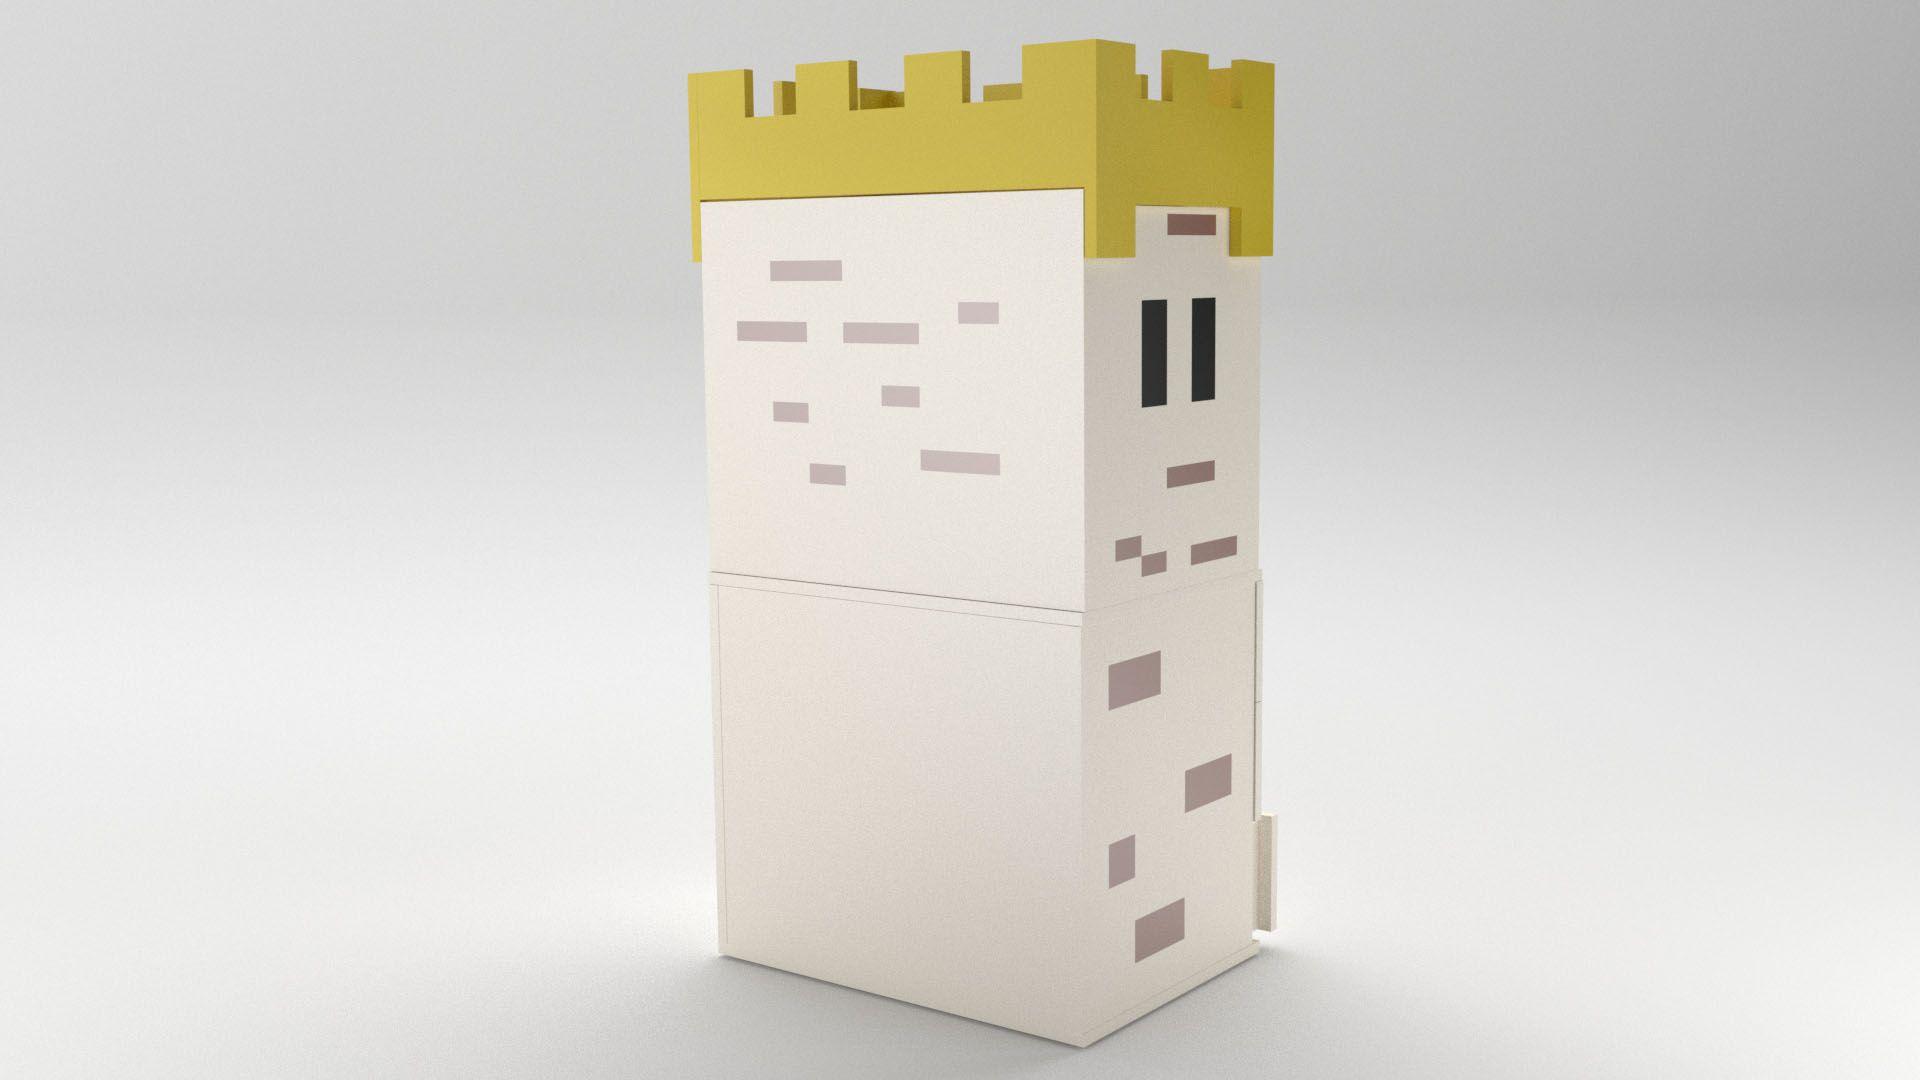 Model Camelot CabinetShelf Vista 2